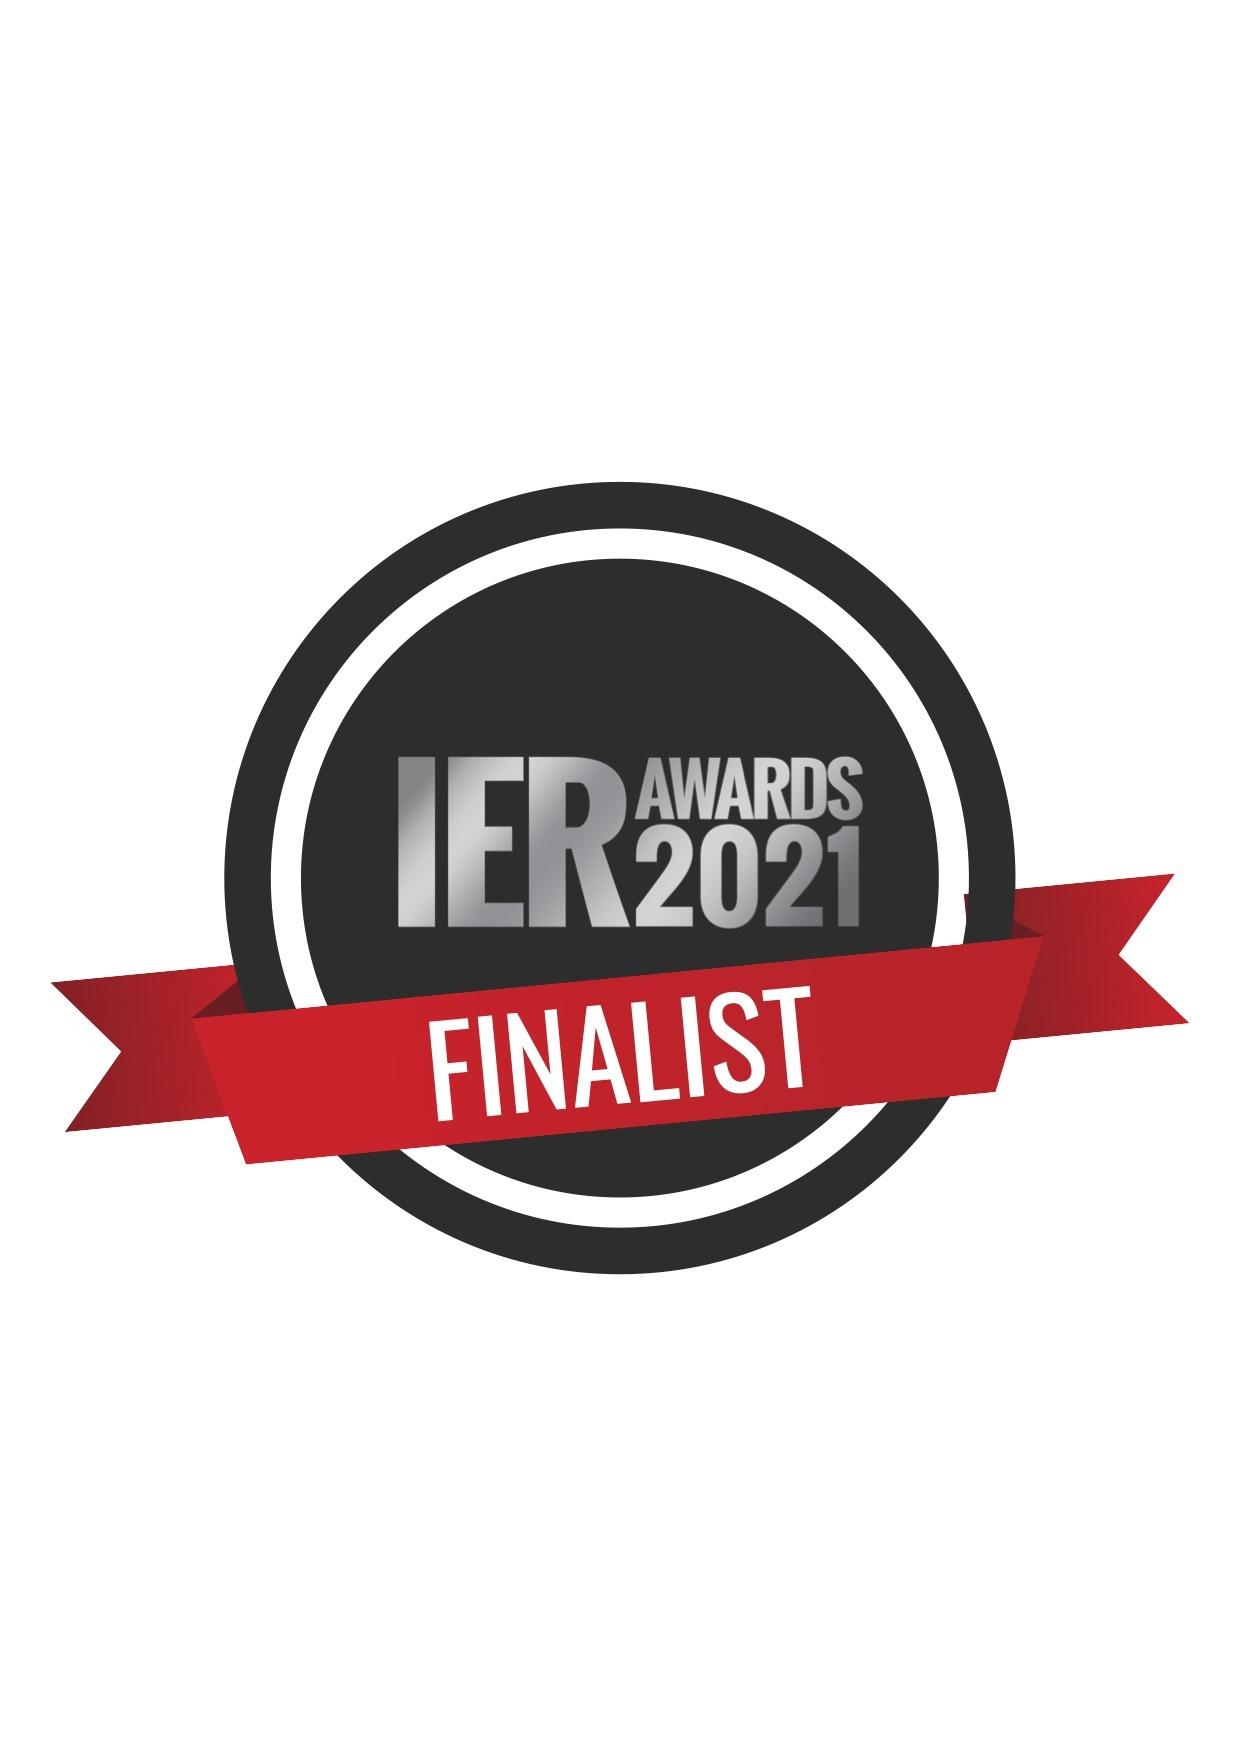 "IER Award Finalist 2021 for "" Best Independent Retailer Website""."